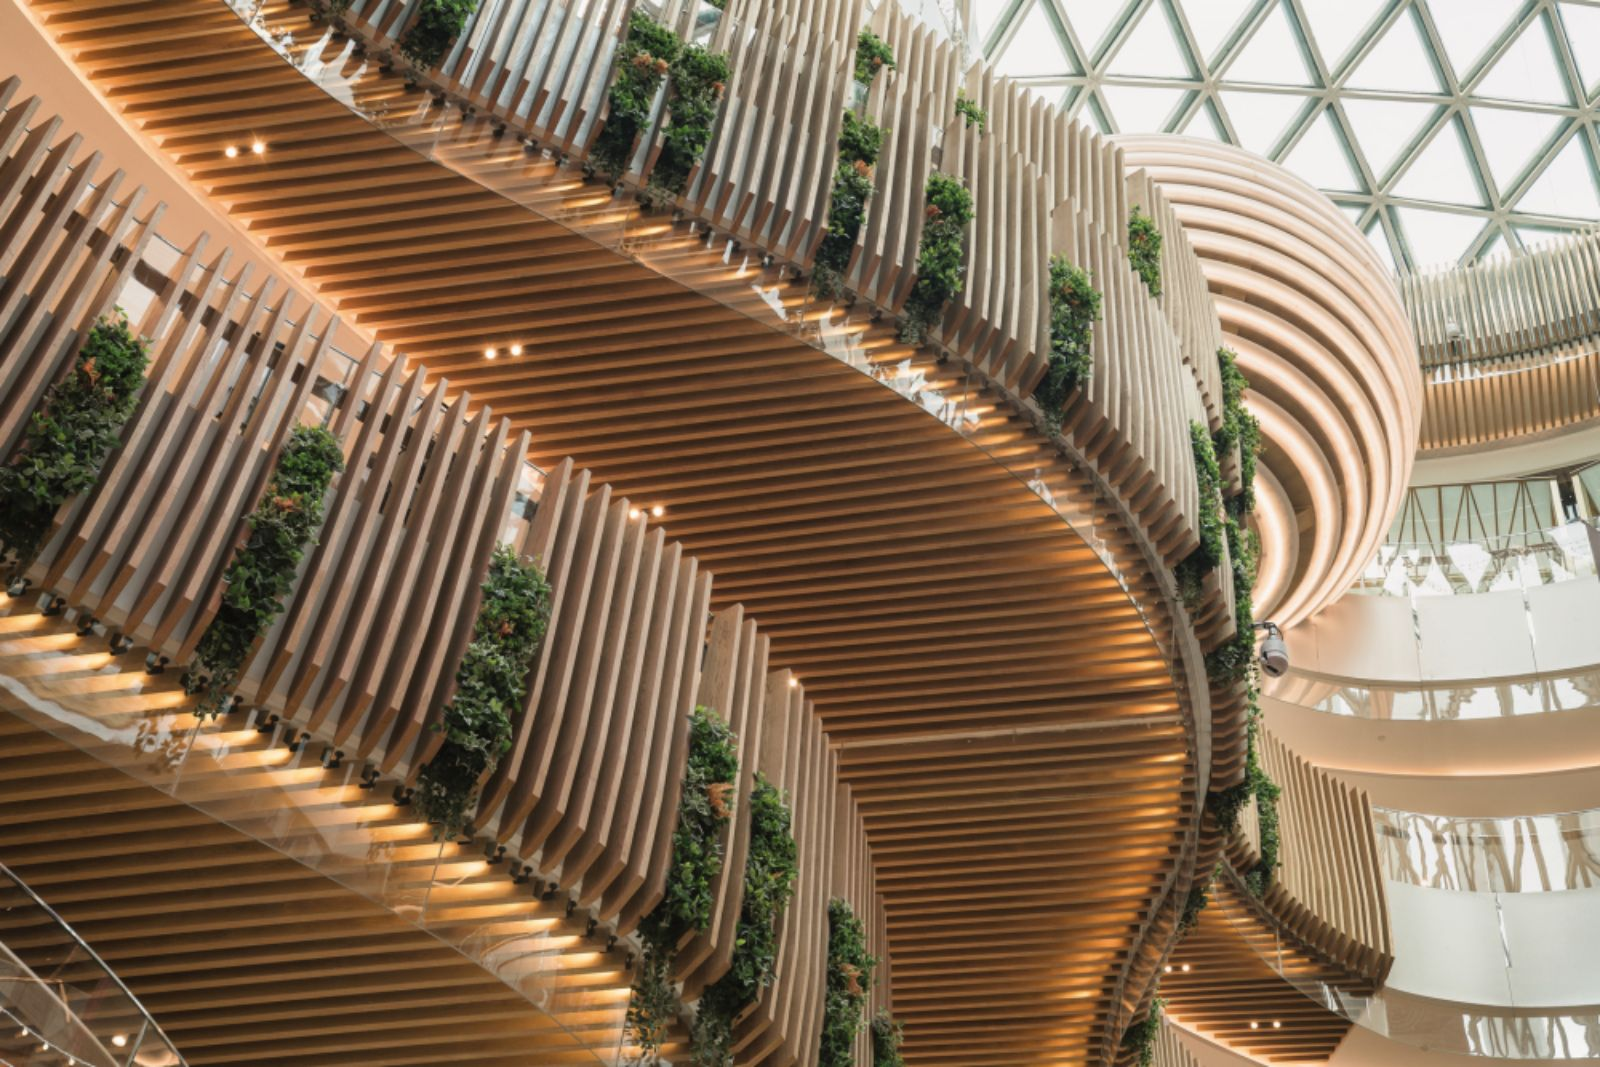 Inside Benoy's 'City park' retail development in Tianjin